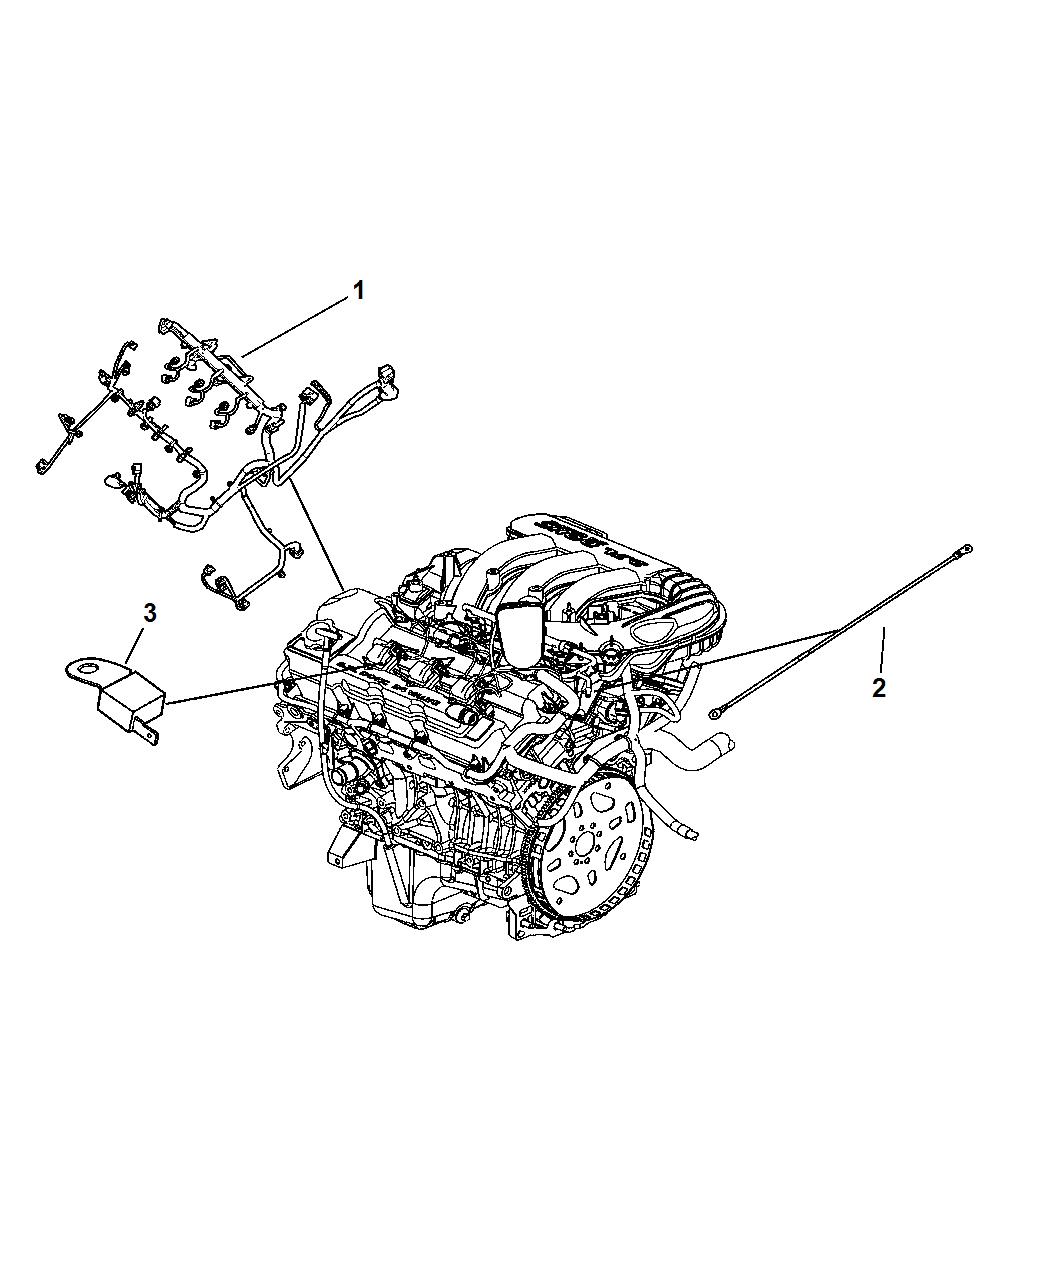 [EQHS_1162]  NX_3652] 08 Dodge Charger Engine Diagram Schematic Wiring | 2008 2 7 V6 Chrysler Engine Diagram |  | Vira Subd Lite Tixat Rosz Trons Mohammedshrine Librar Wiring 101